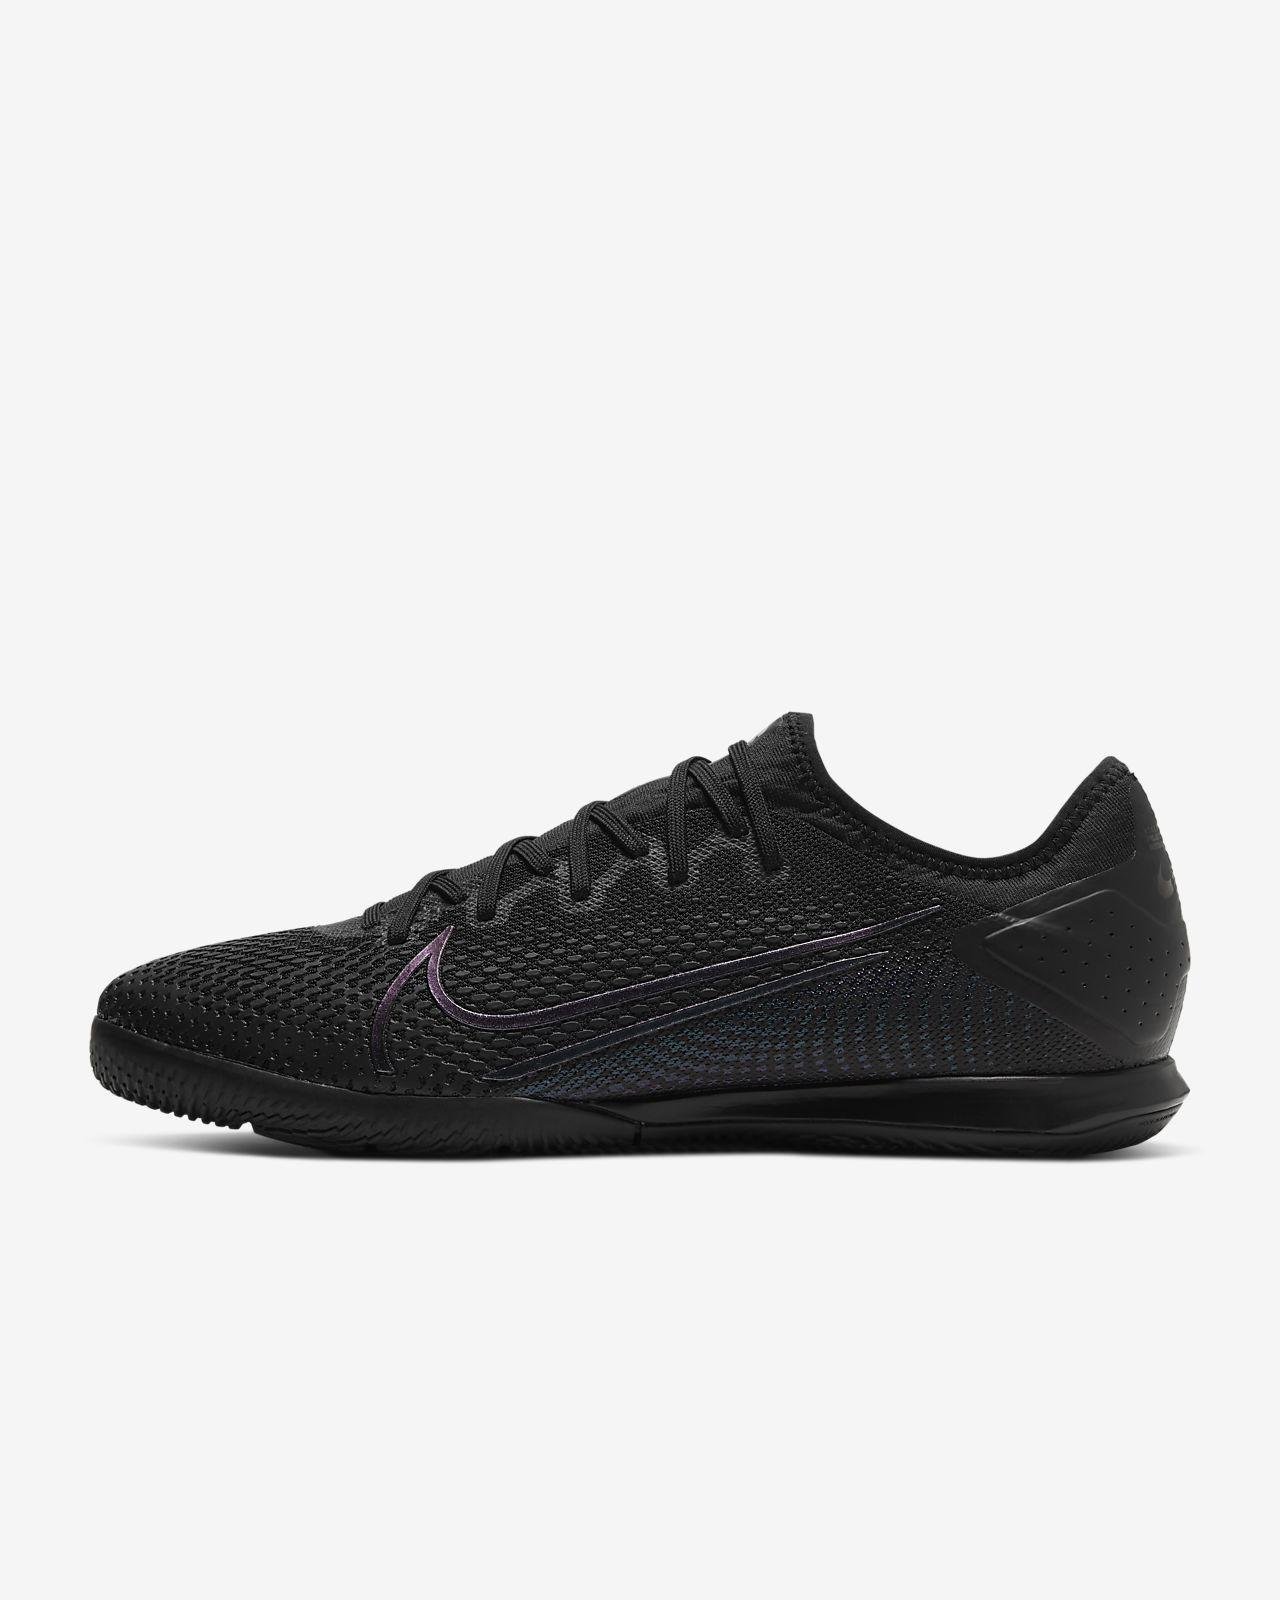 Sapatilhas de futsal Nike Mercurial Vapor 13 Pro IC